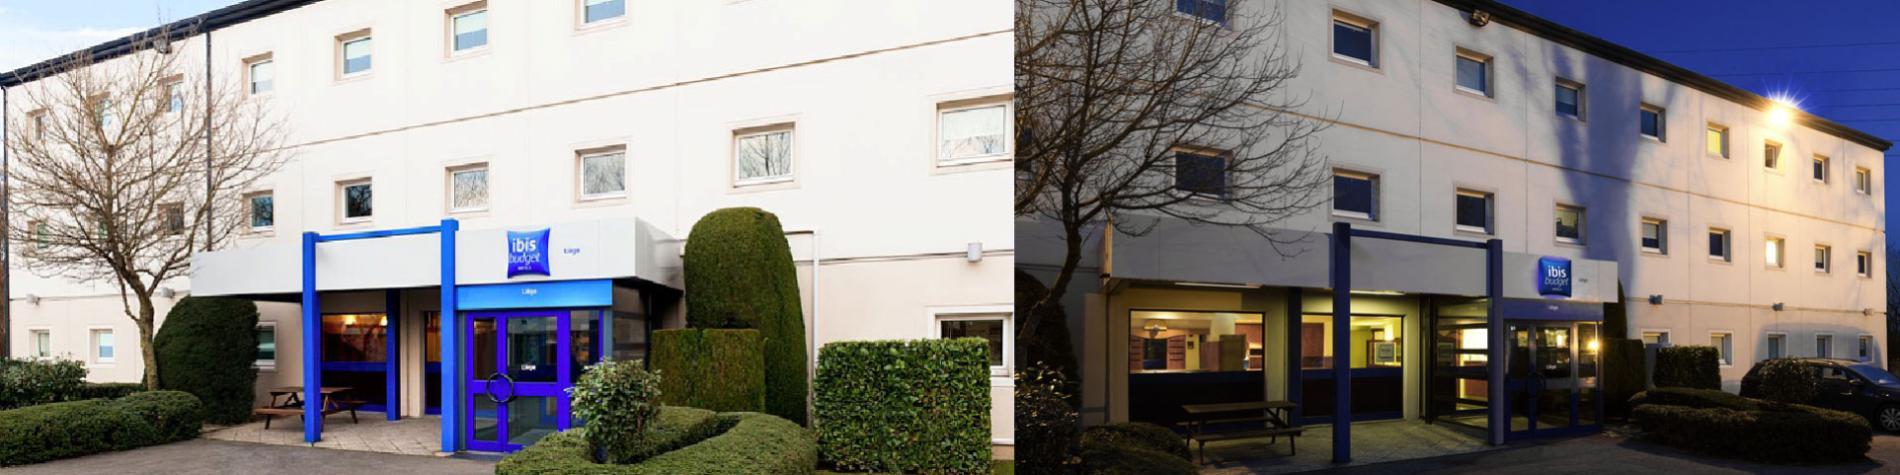 Hôtel - Ibis Budget - Liège